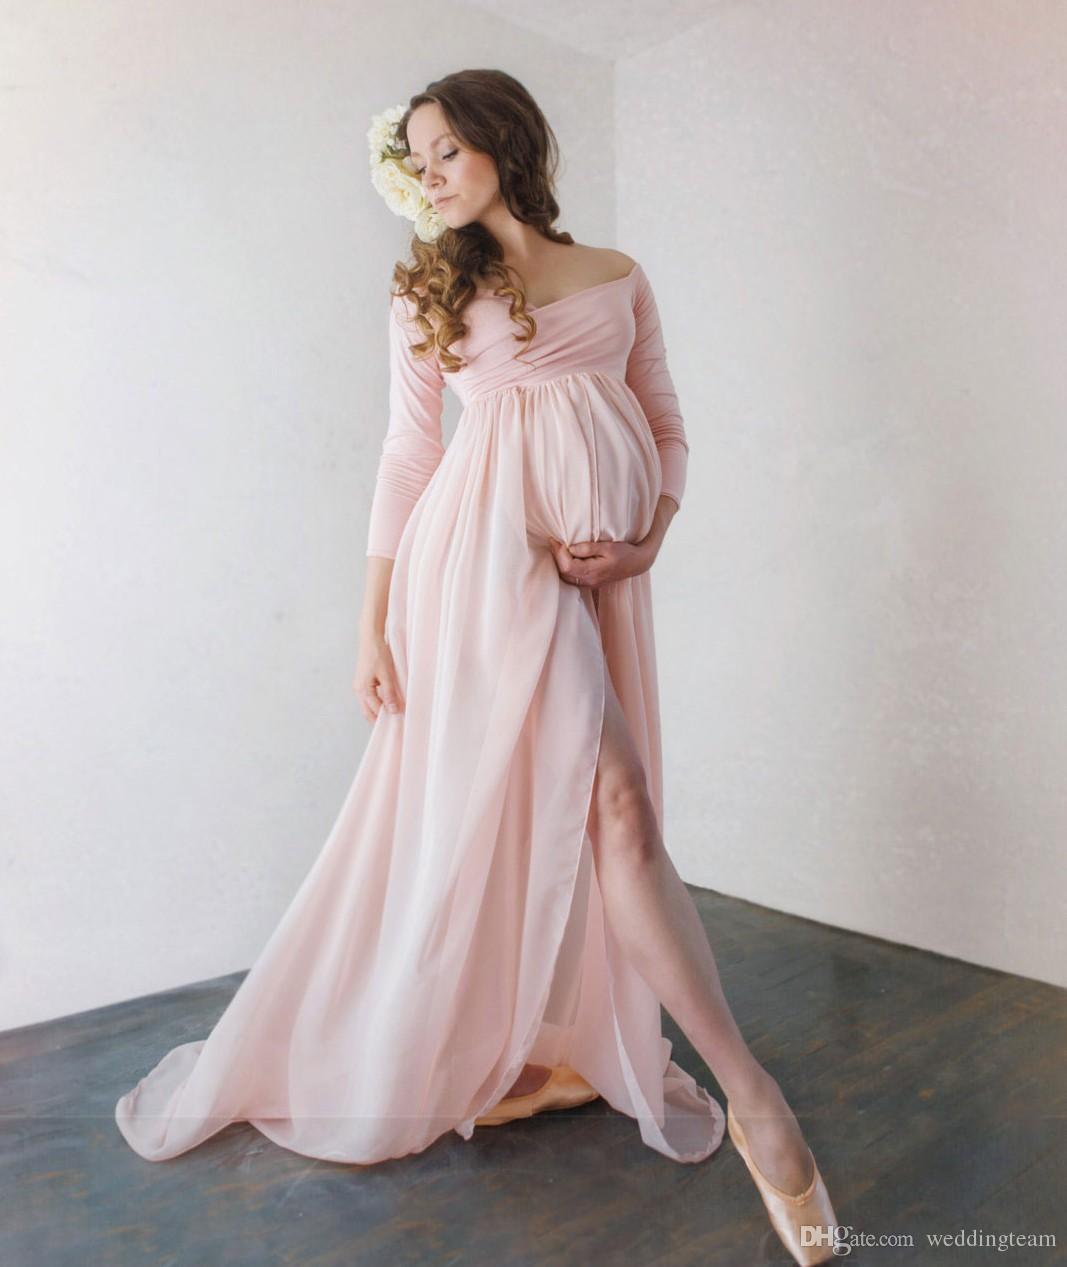 e053c82c2cf5a Plus Size Maternity Dresses Canada